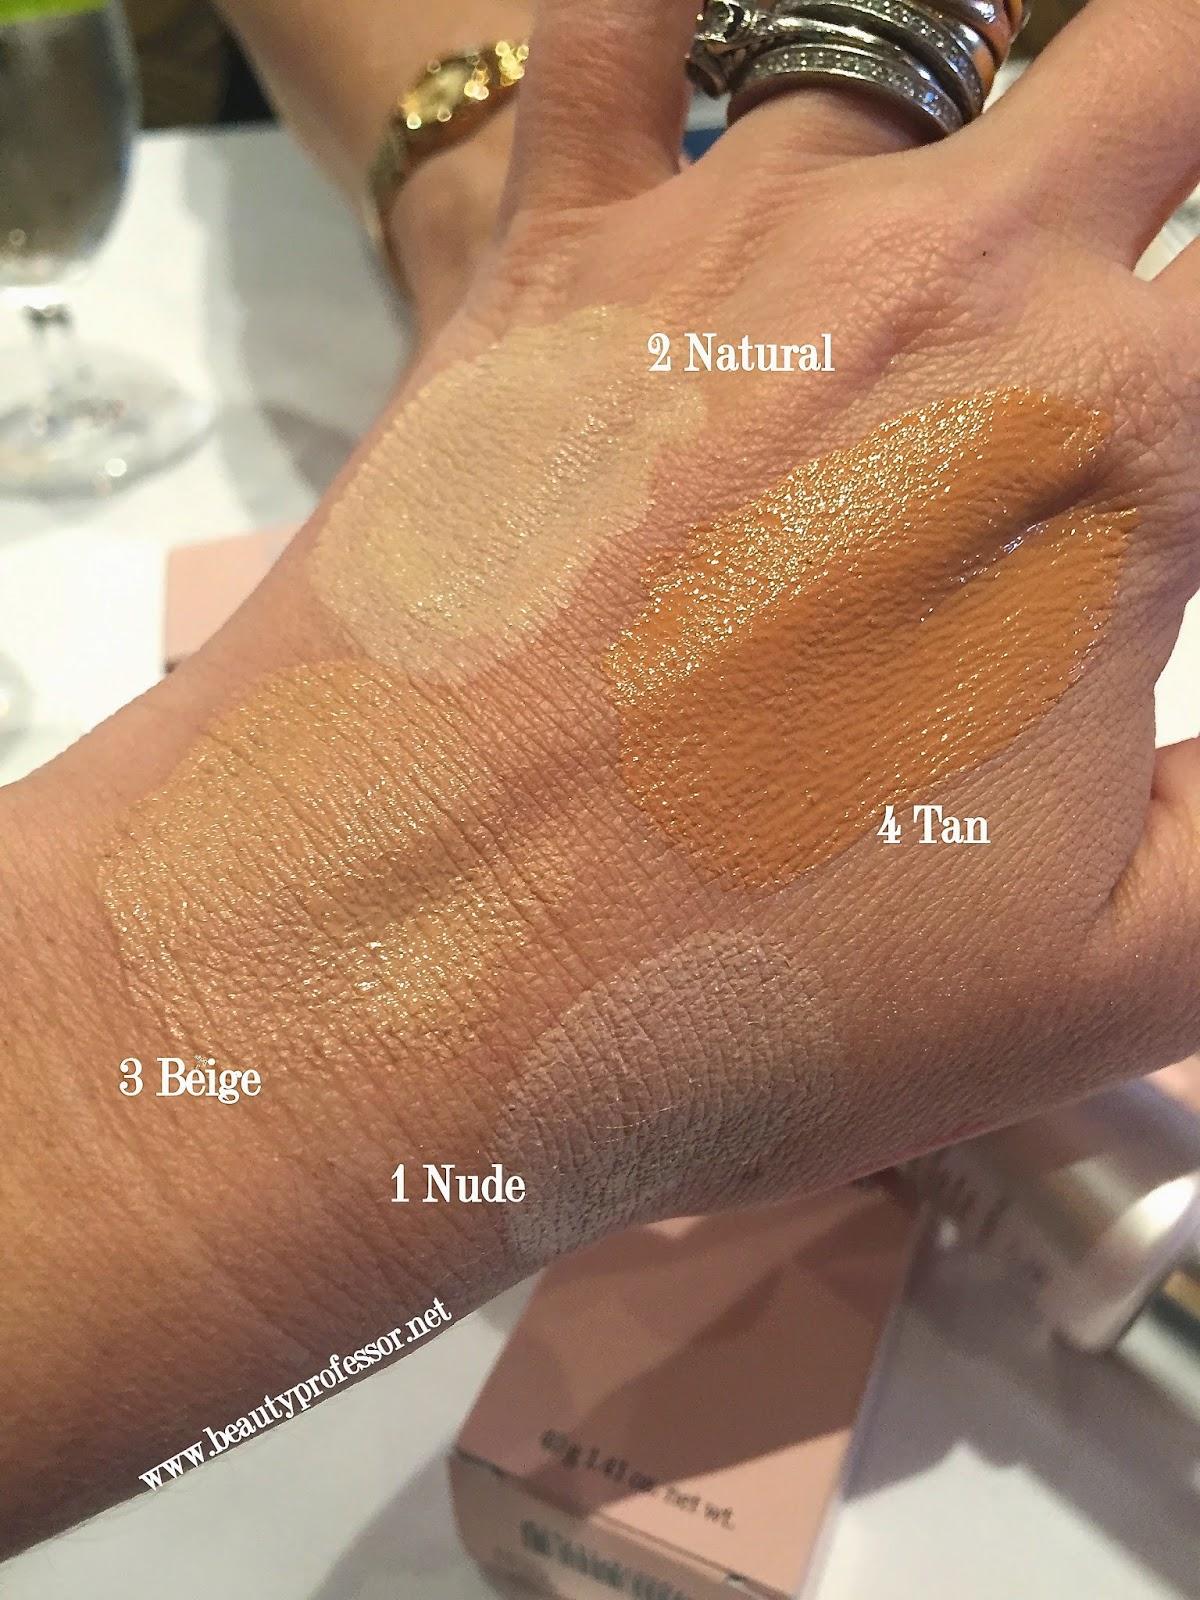 by terry cellularose moisturizing cc cream swatches